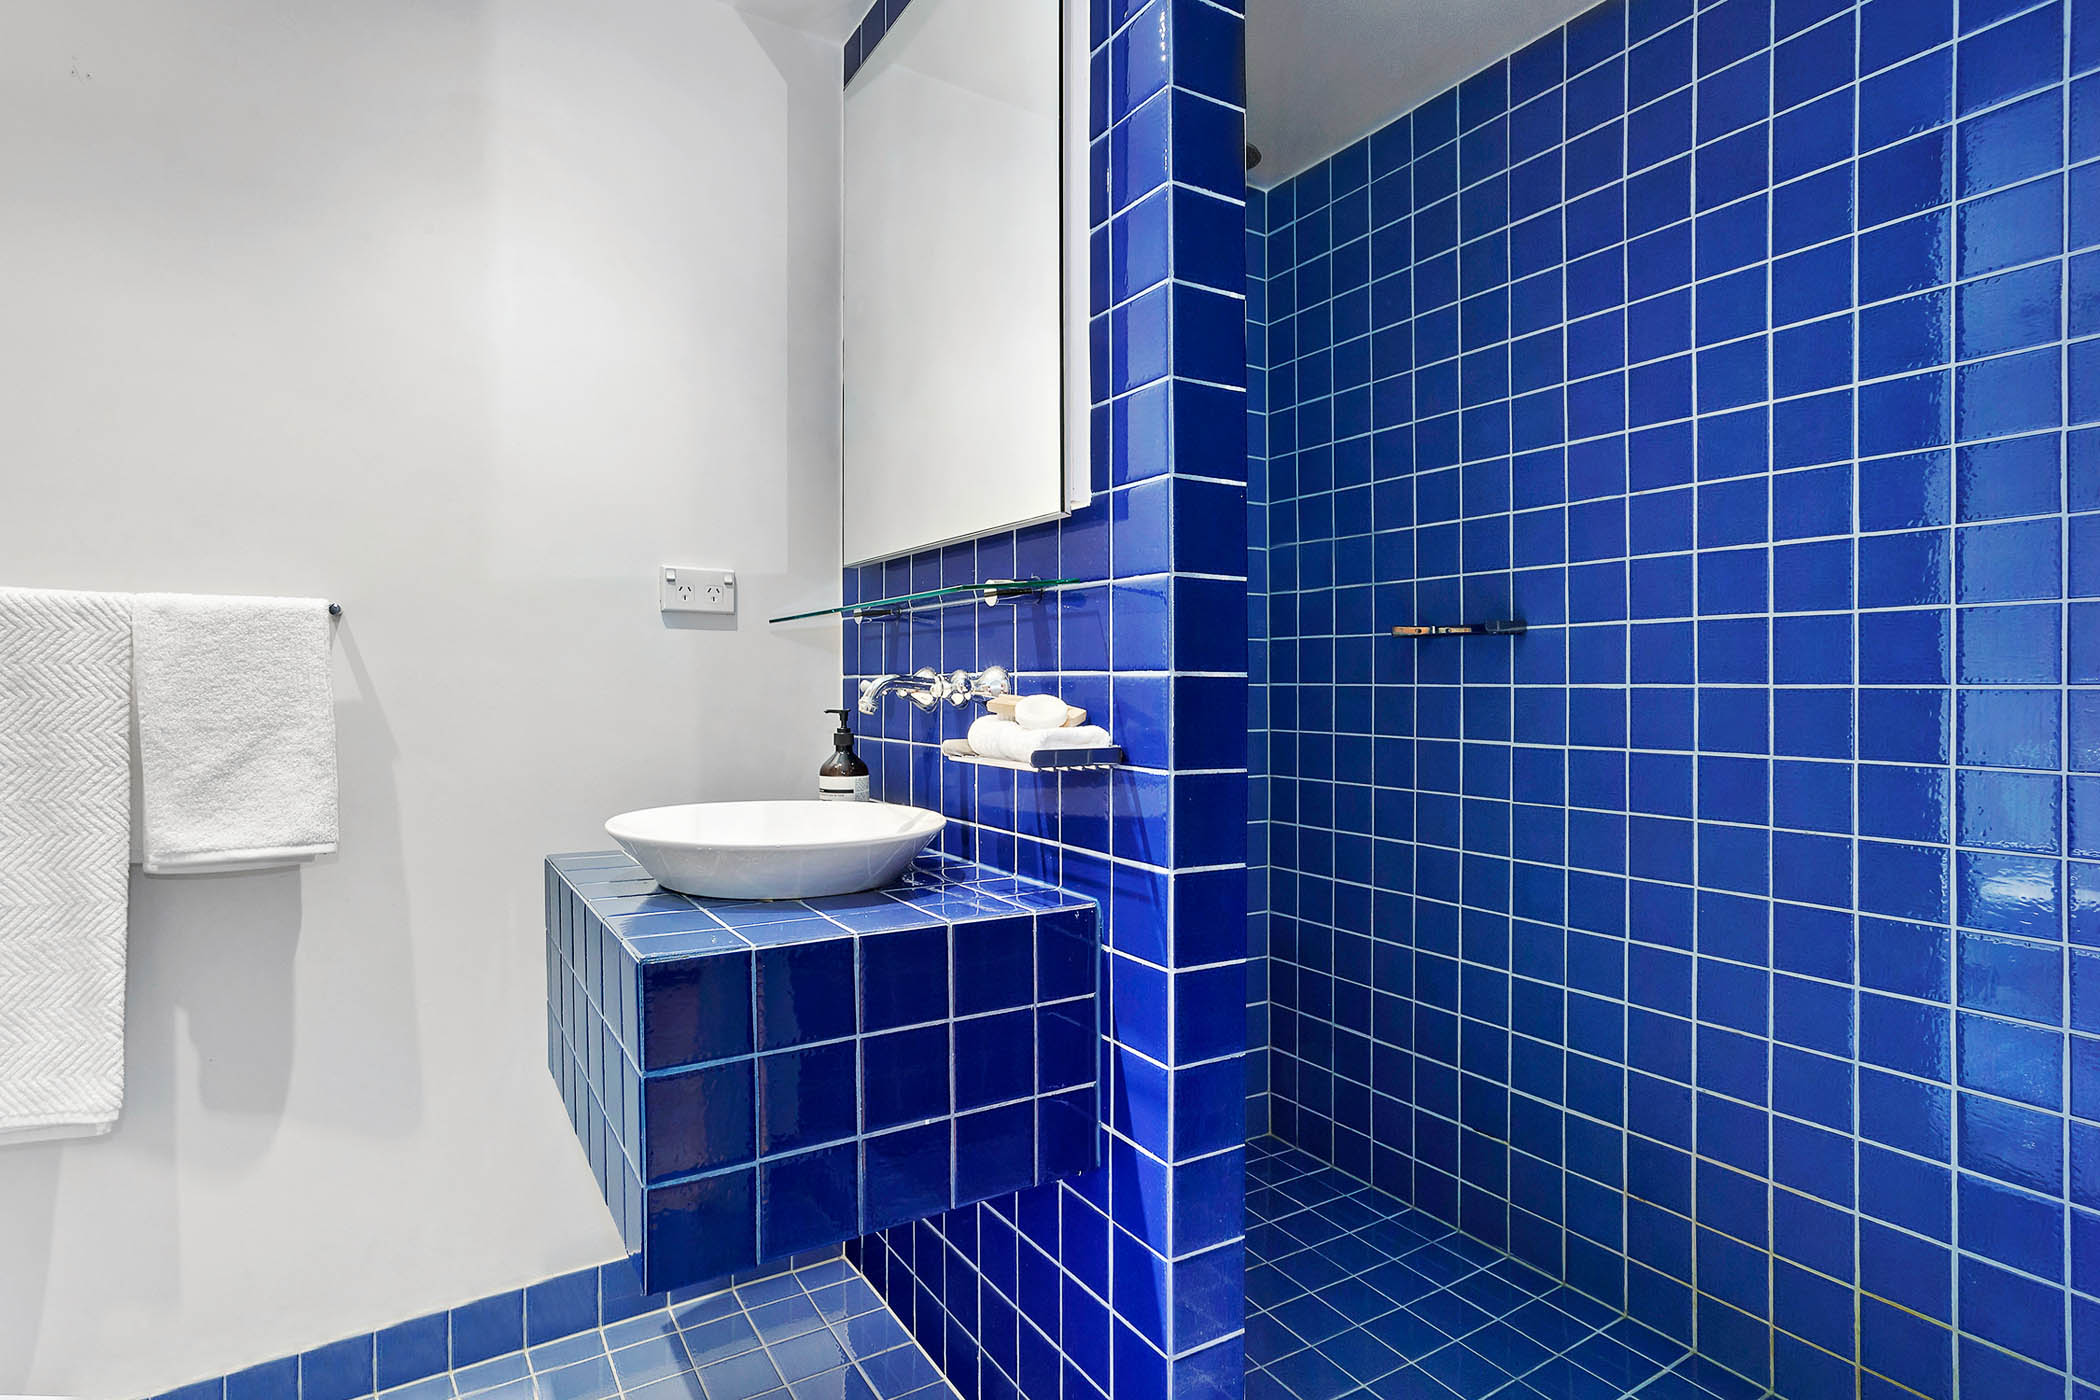 1804-31-spring-street-melbourne-student-accommodation-Melbourne-Bathroom-Unilodgers